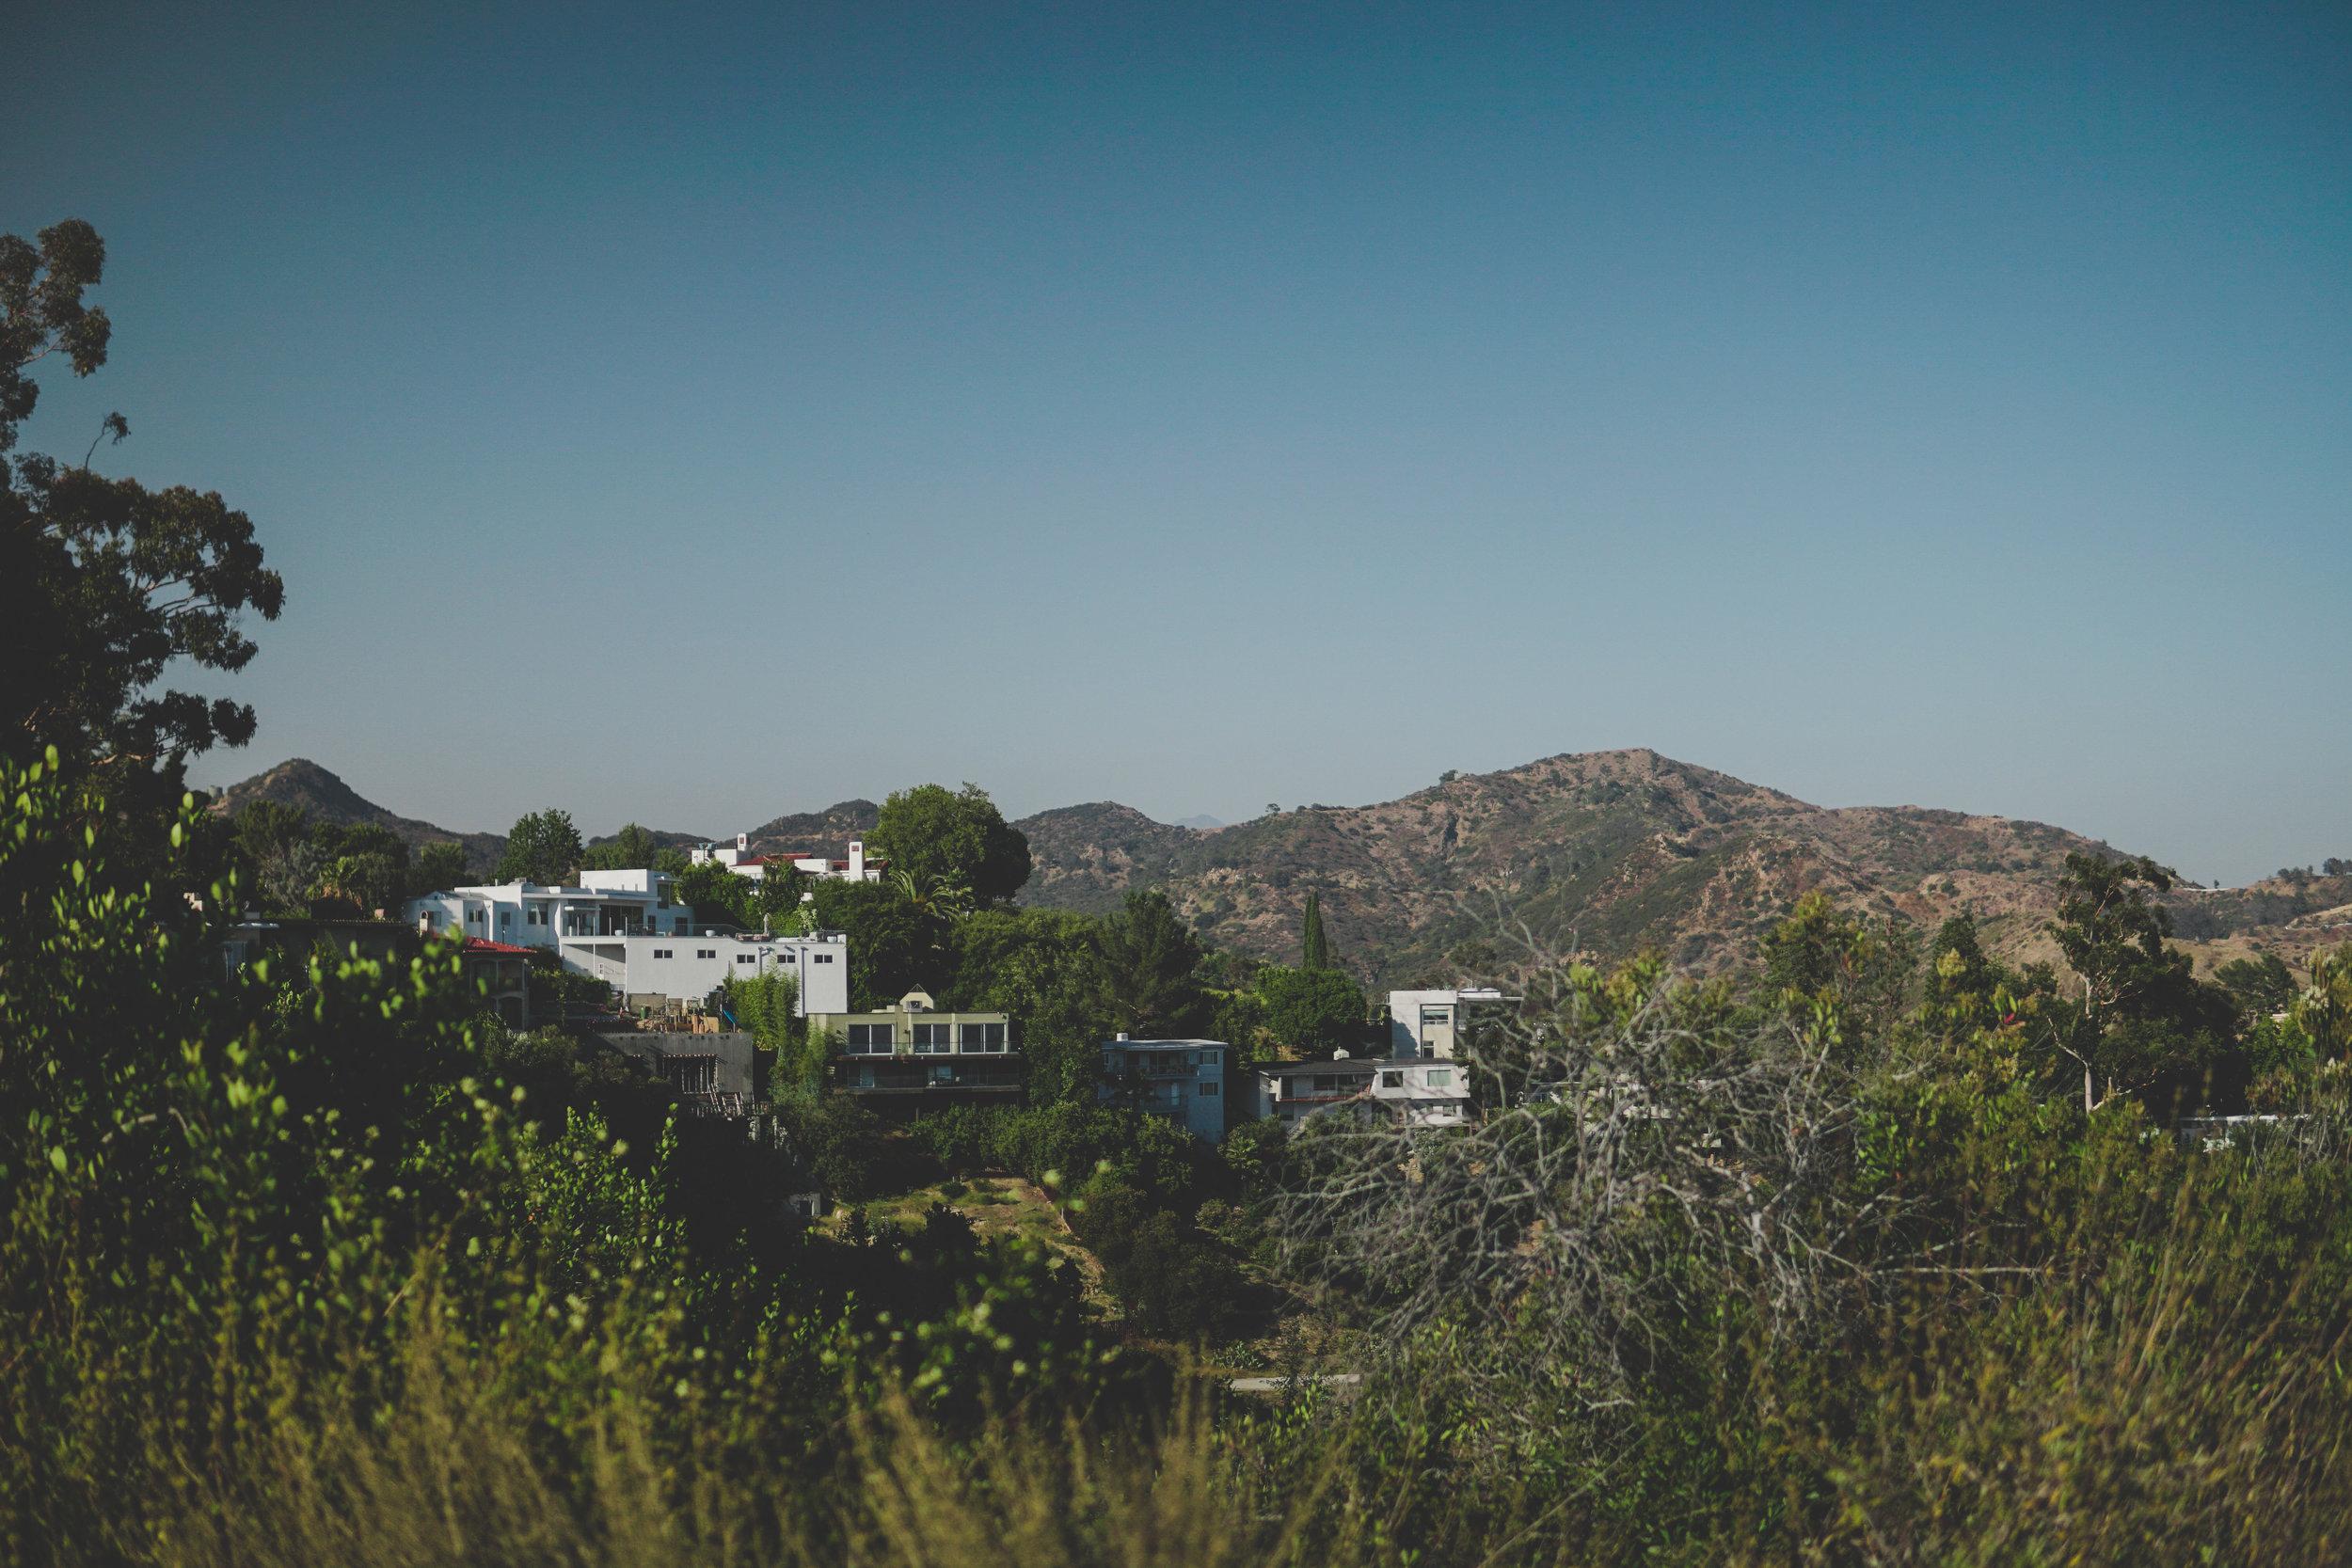 Laurel Canyon -